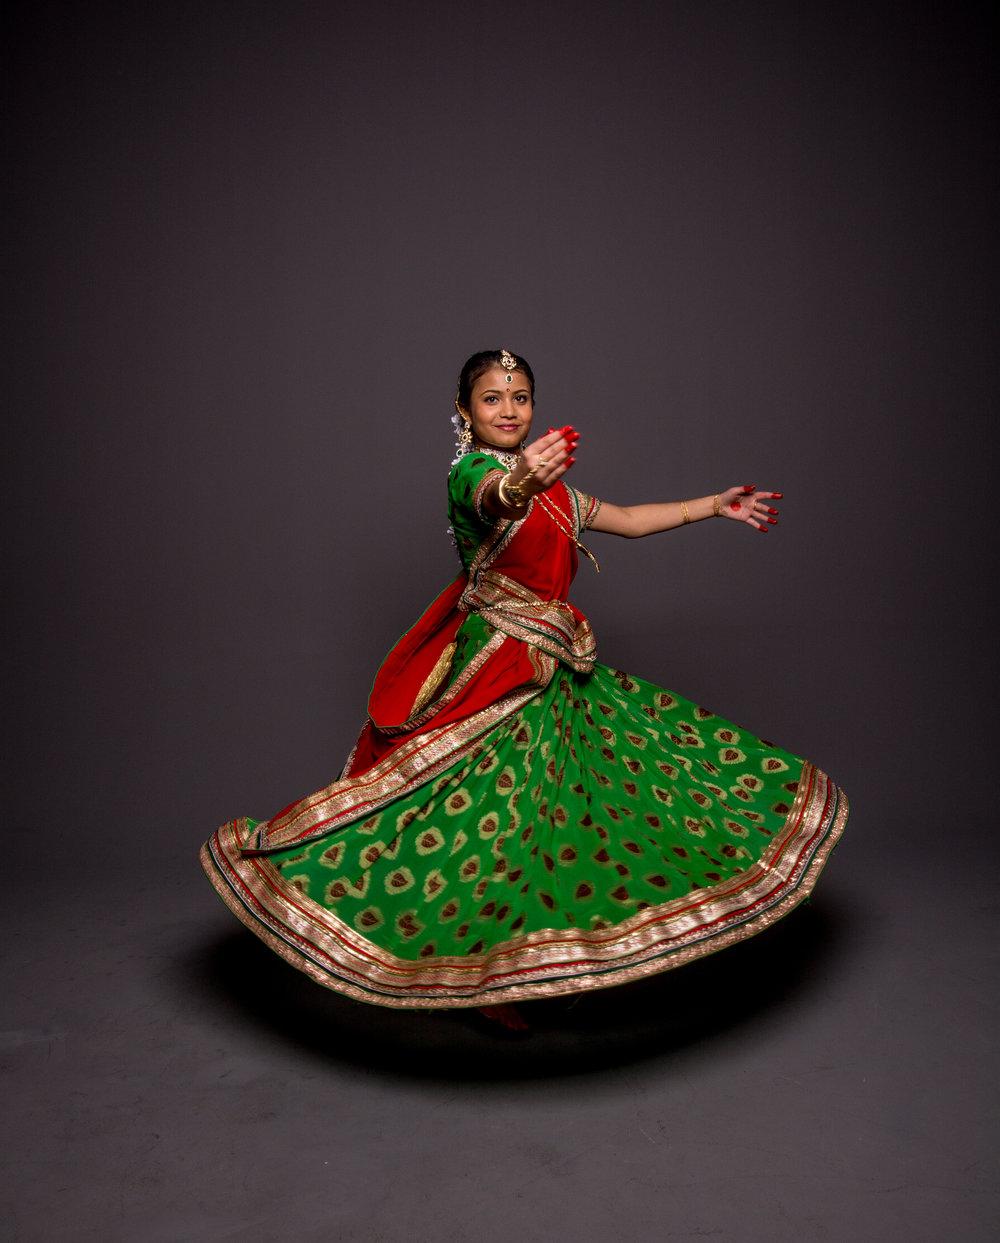 Ritika&RishaMehta_StudioPortraits_MuncieIndiana_March2017_SamanthaRosePhotography_-61.jpg